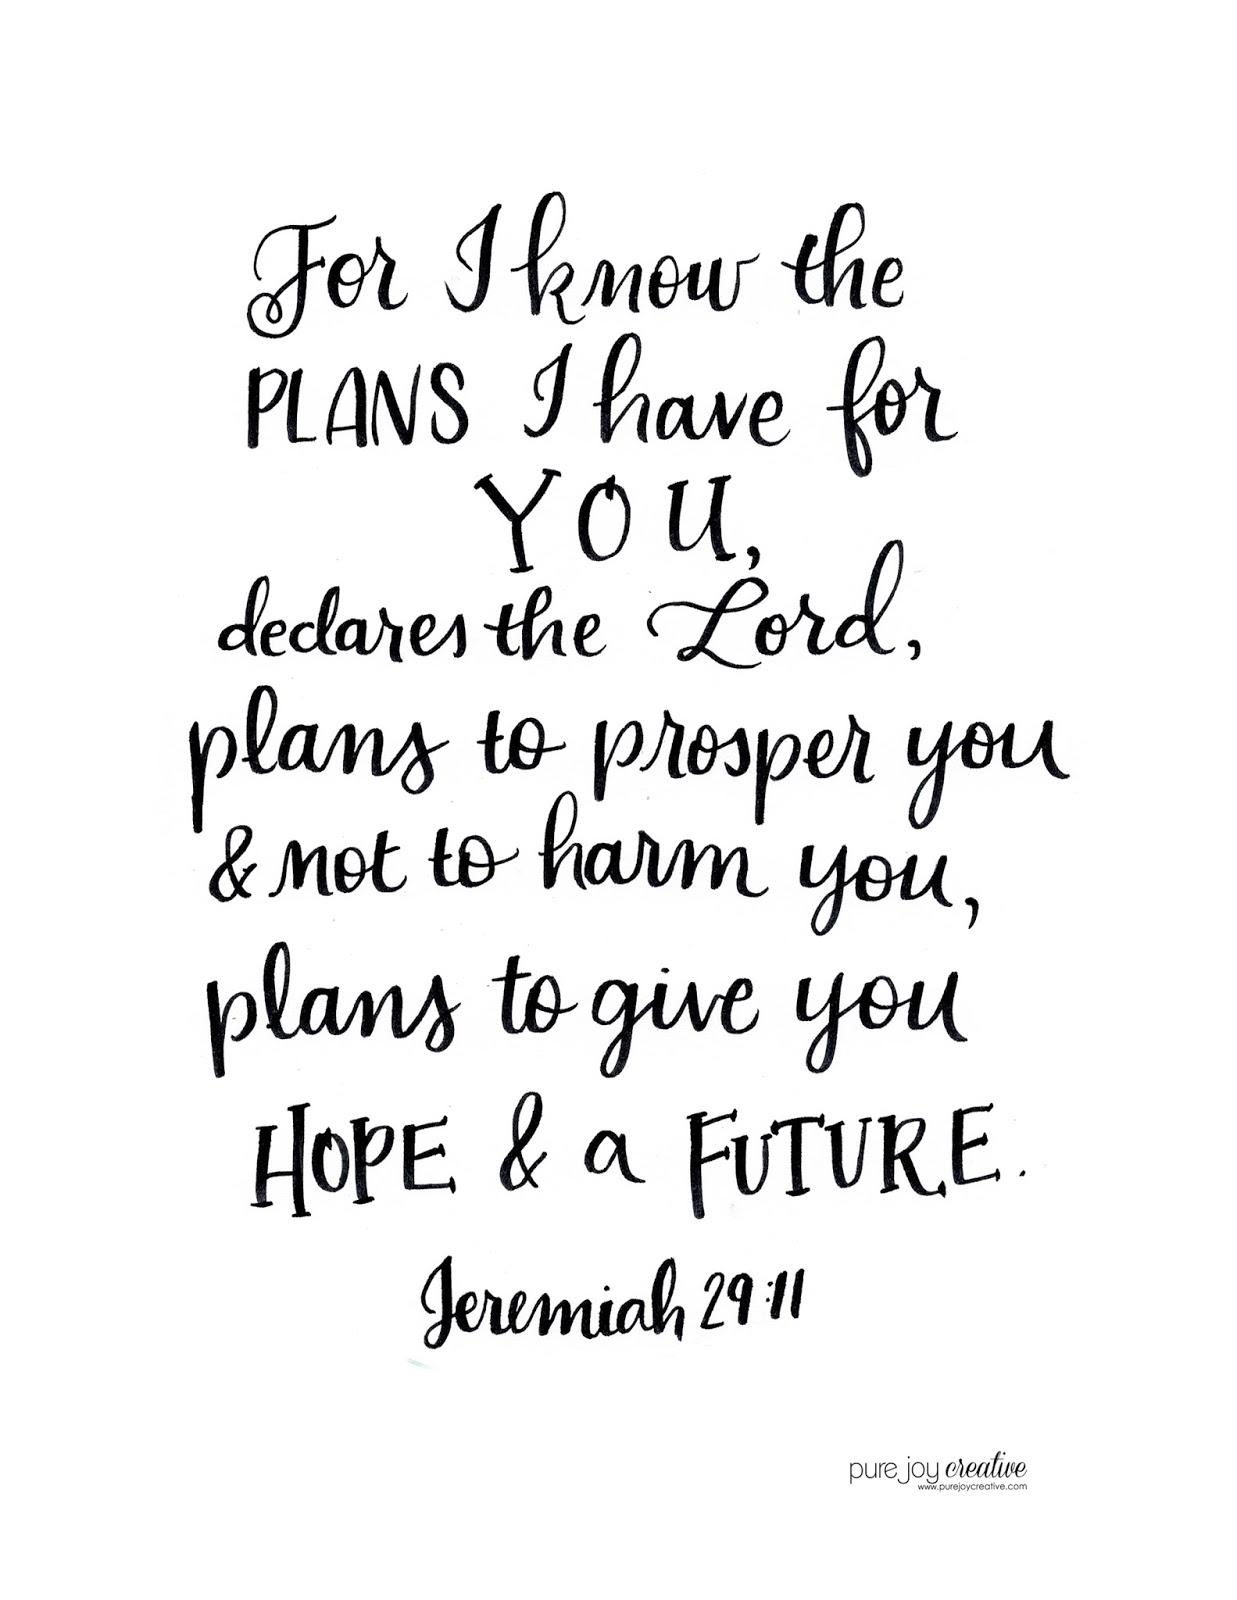 Pure Joy Creative: Jeremiah 29:11 FREE printable